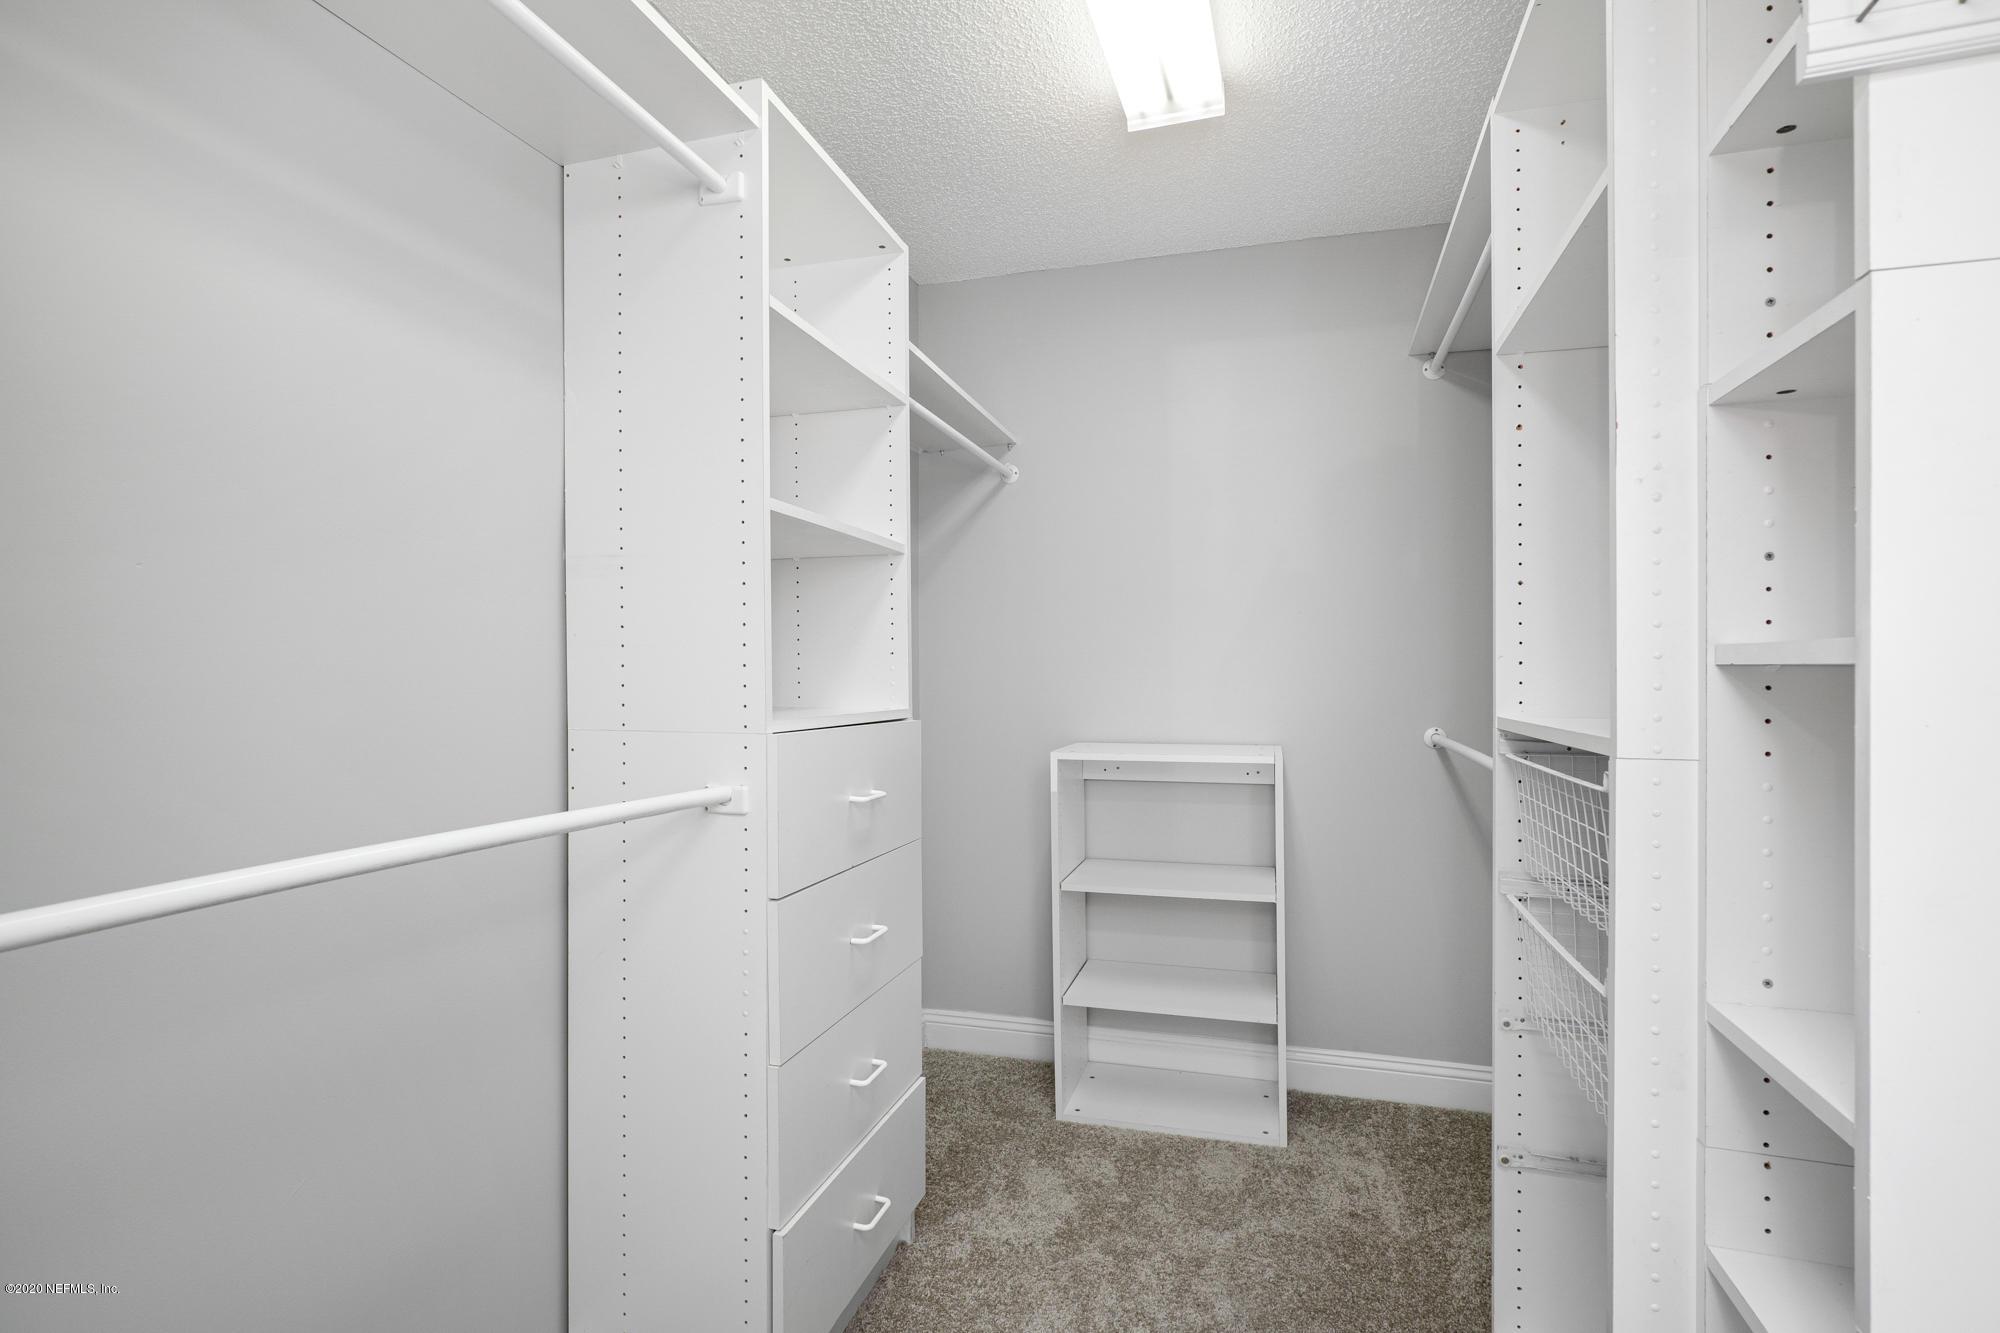 2146 WALKABOUT, JACKSONVILLE, FLORIDA 32224, 4 Bedrooms Bedrooms, ,2 BathroomsBathrooms,Residential,For sale,WALKABOUT,1079823